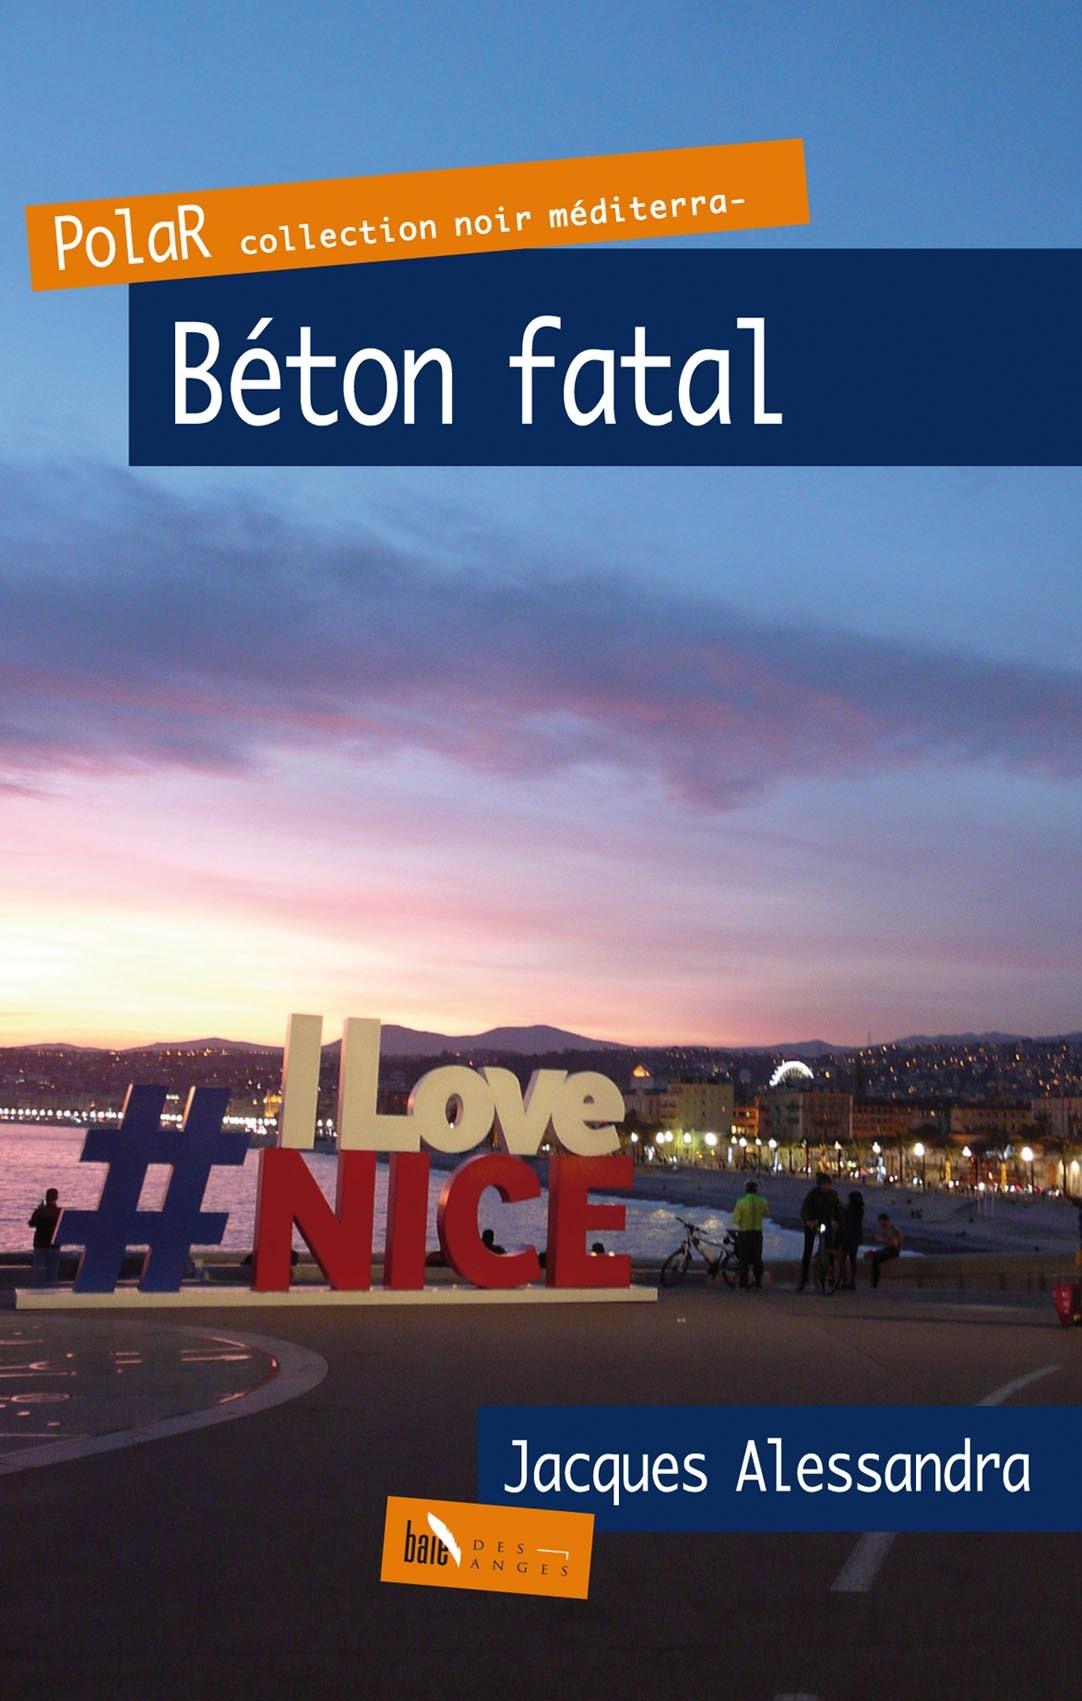 BETON FATAL